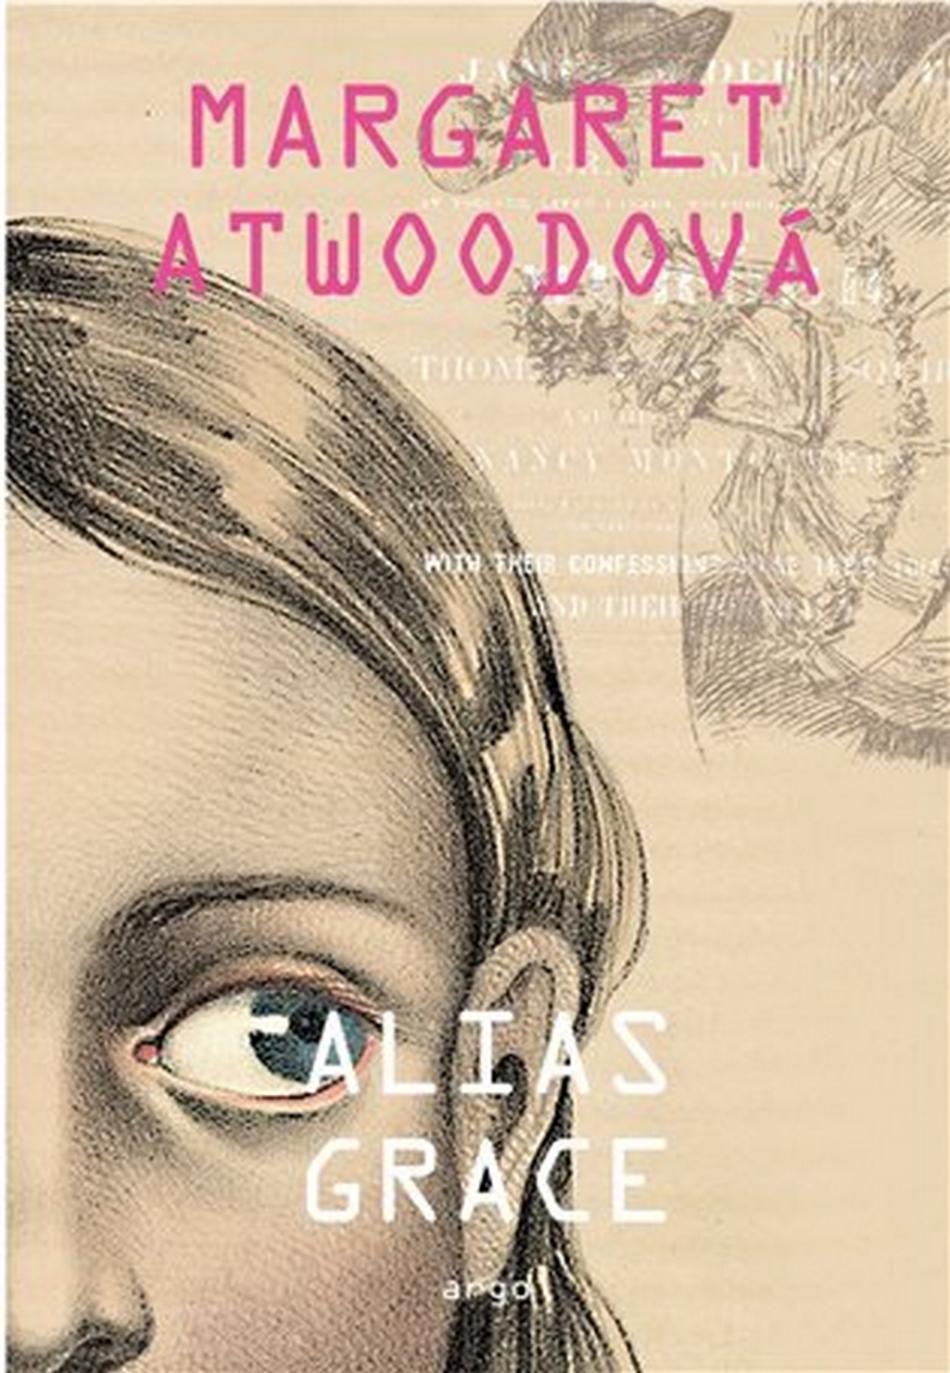 Margaret Atwoodová / Alias Grace